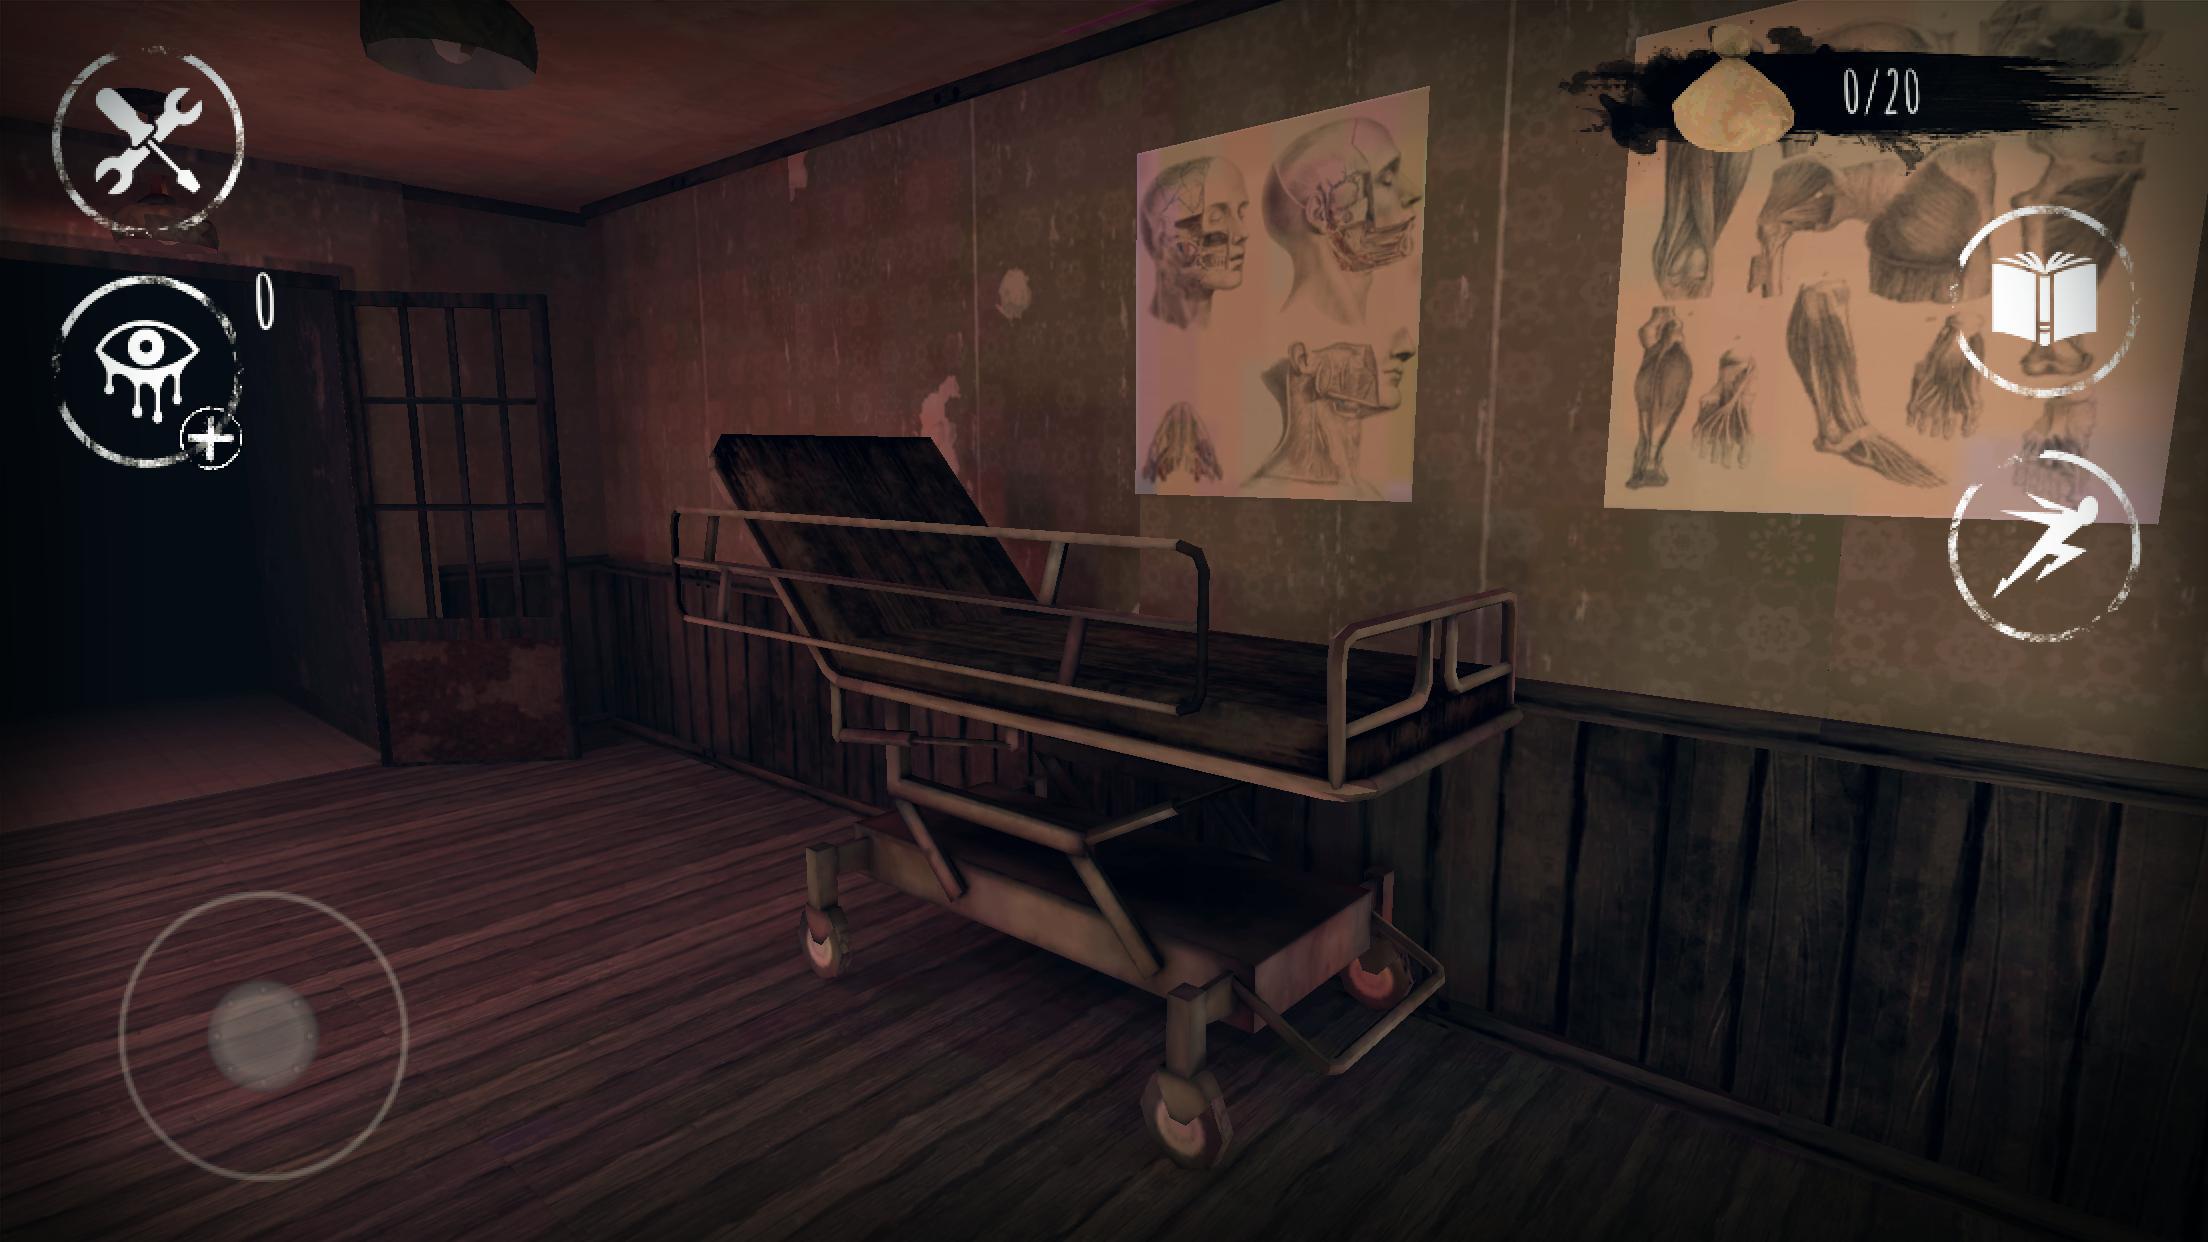 Eyes: Scary Thriller - Creepy Horror Game 6.1.1 Screenshot 17